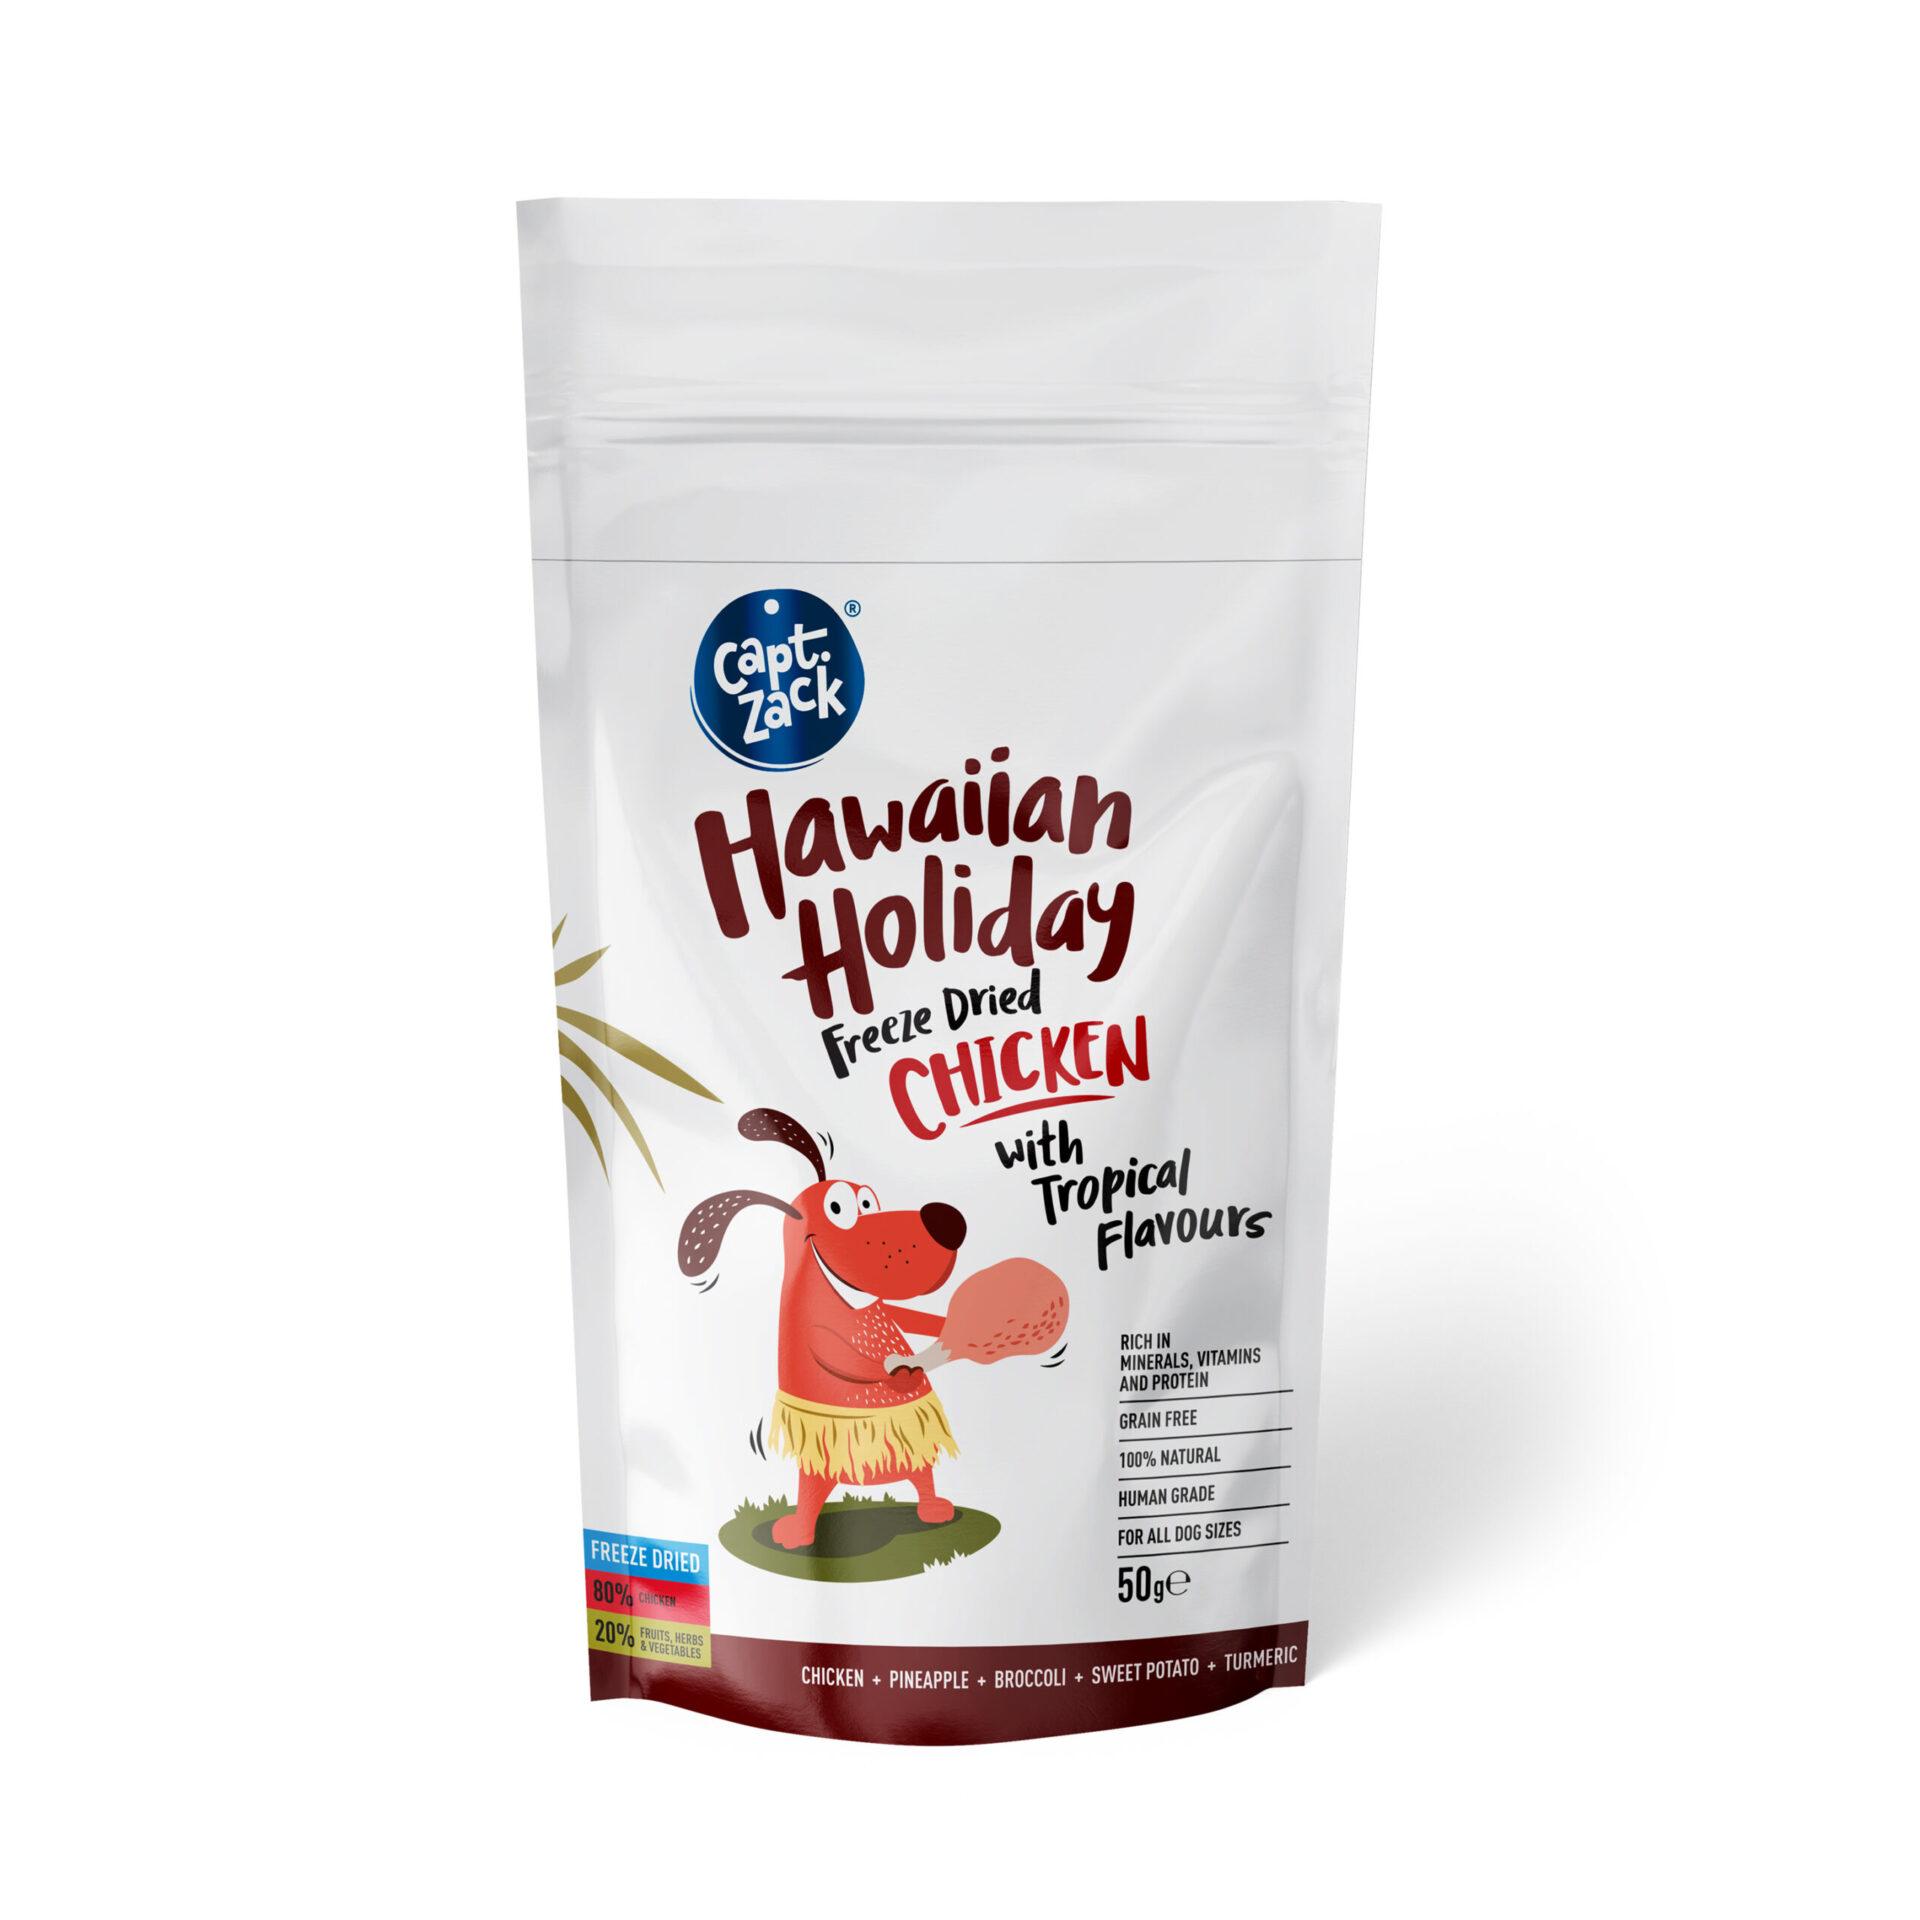 Hawaaiian Holiday_Front Image For Amazon